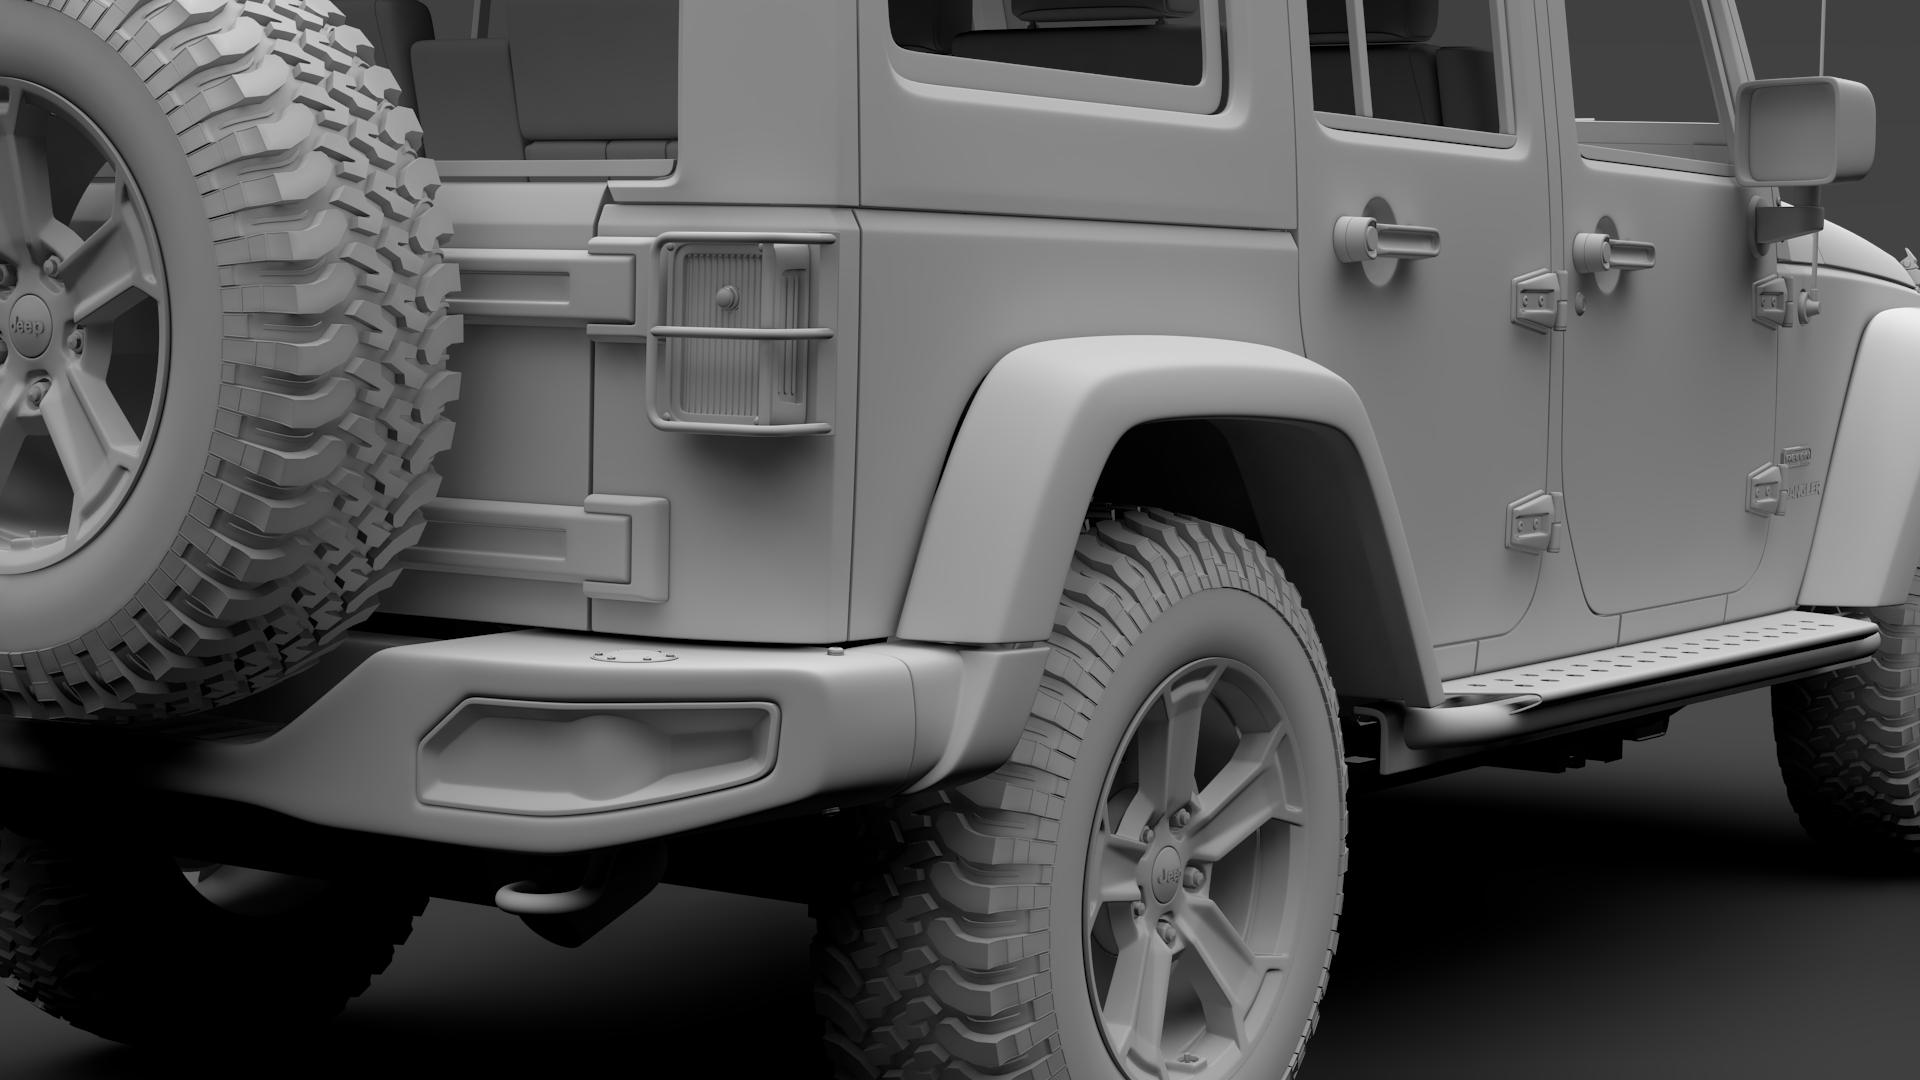 jeep wrangler unlimited rubicon recon jk 2017 3d model max fbx c4d lwo ma mb hrc xsi obj 277017